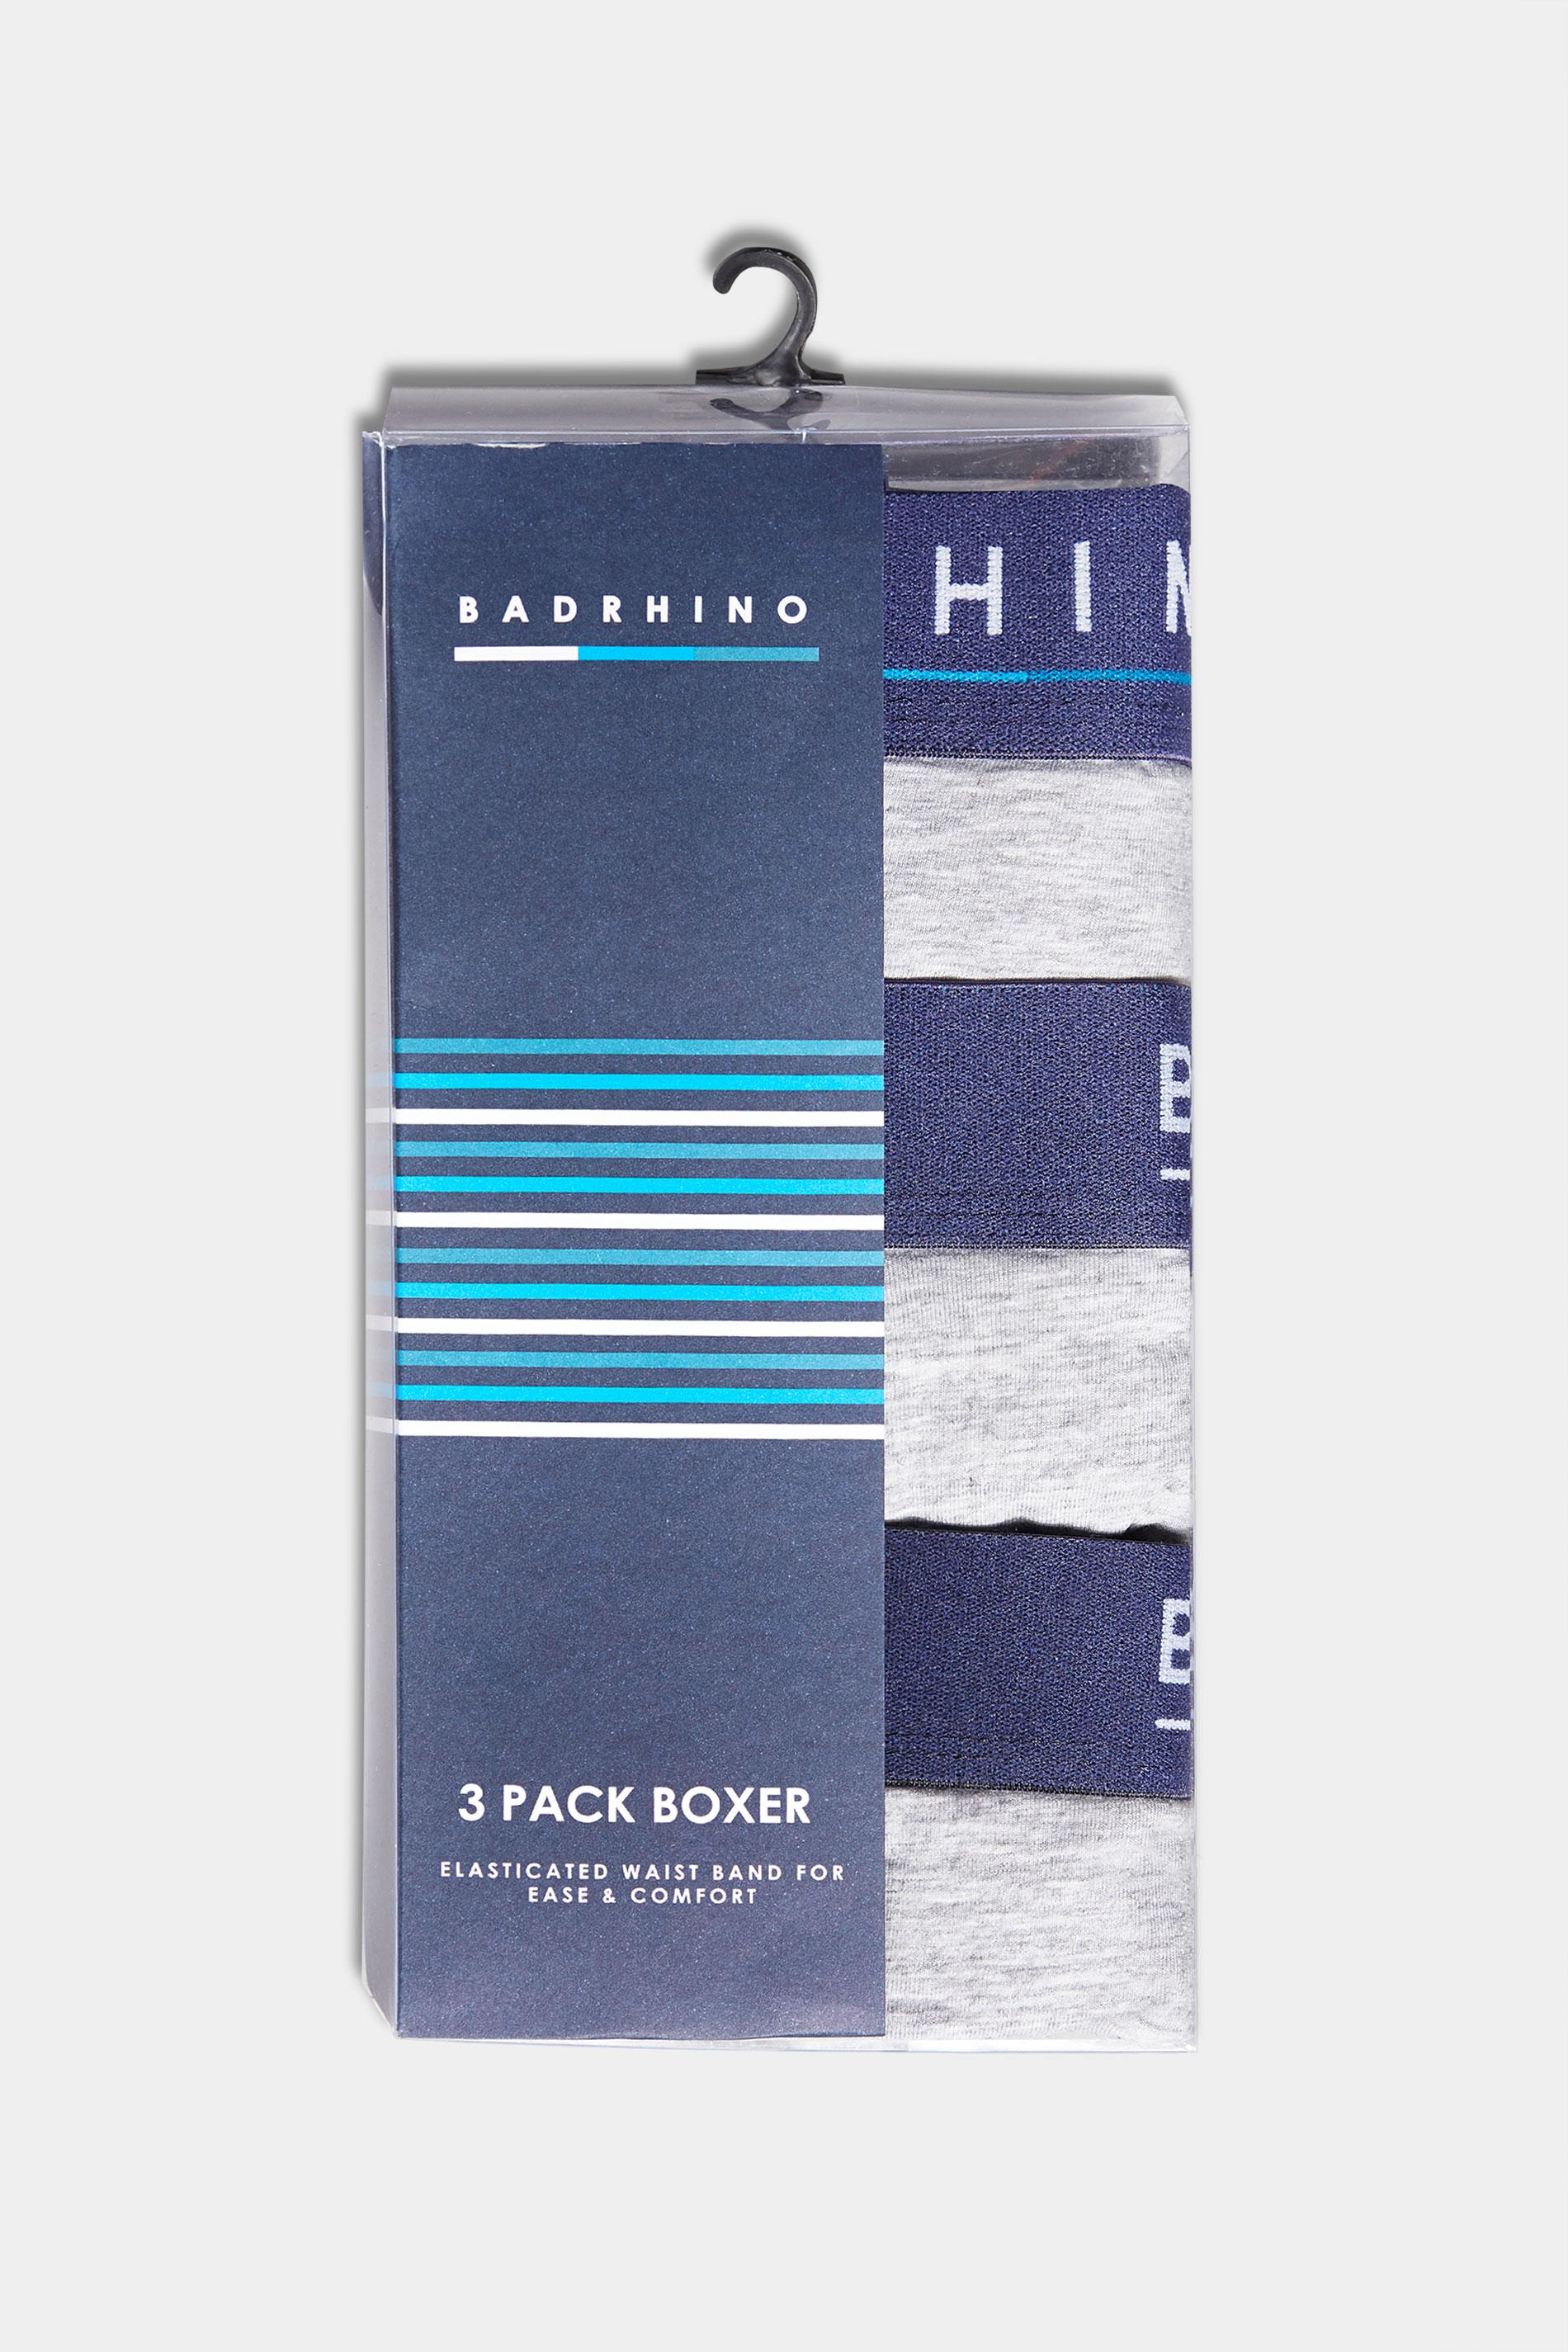 BadRhino Grey Essential 3 Pack Boxers